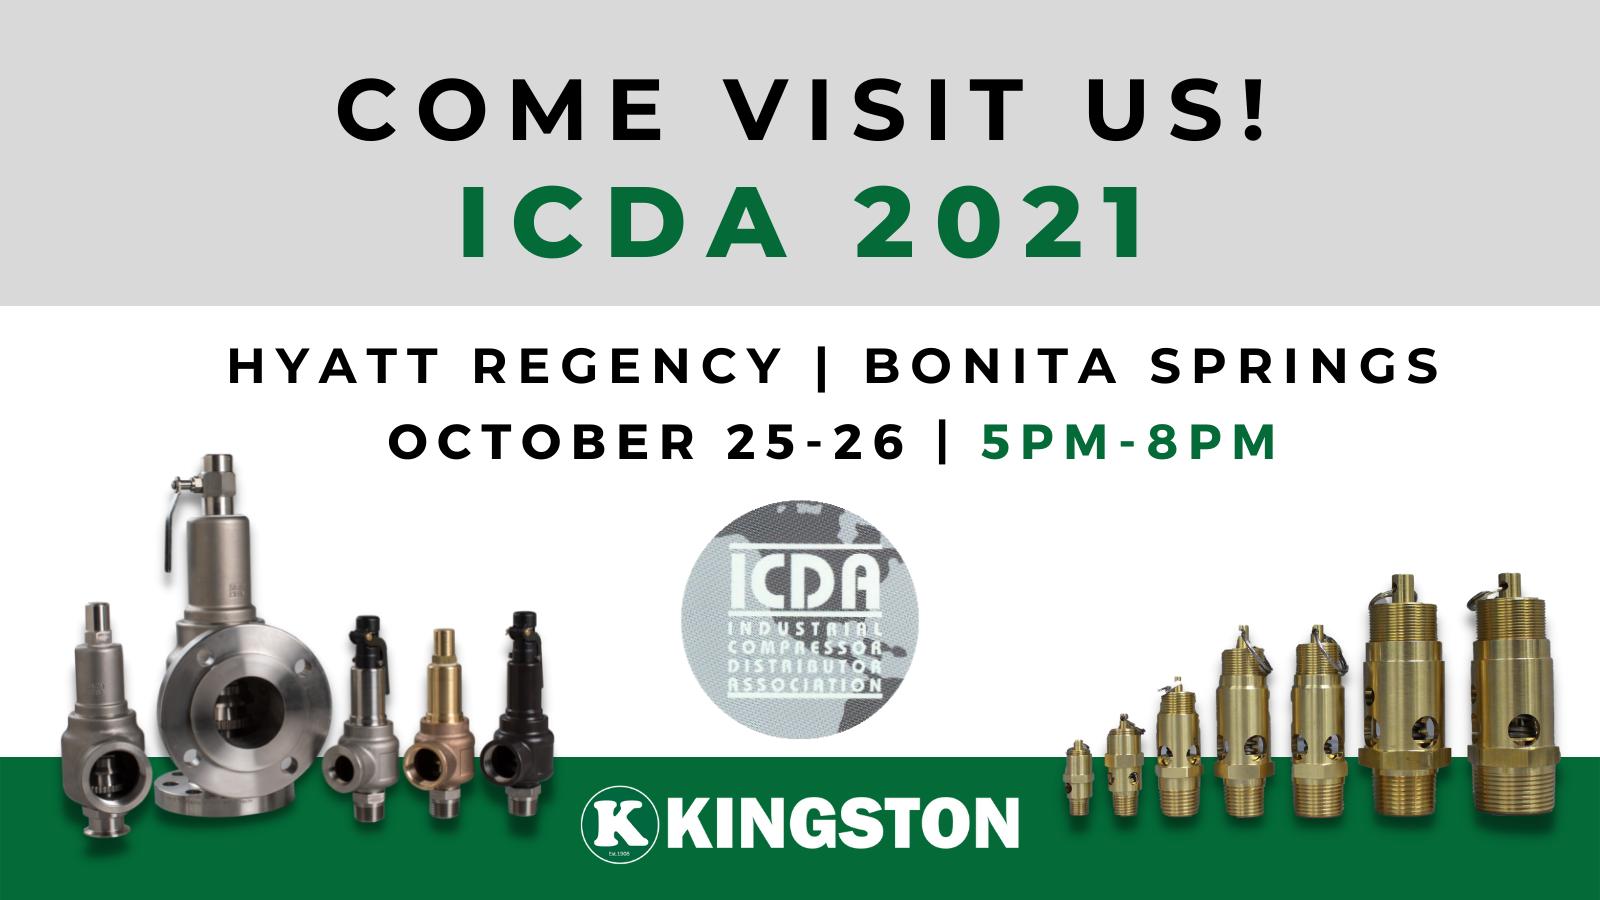 KINGSTON VALVES ICDA 2021 41st Annual ICDA Meeting & Trade Show